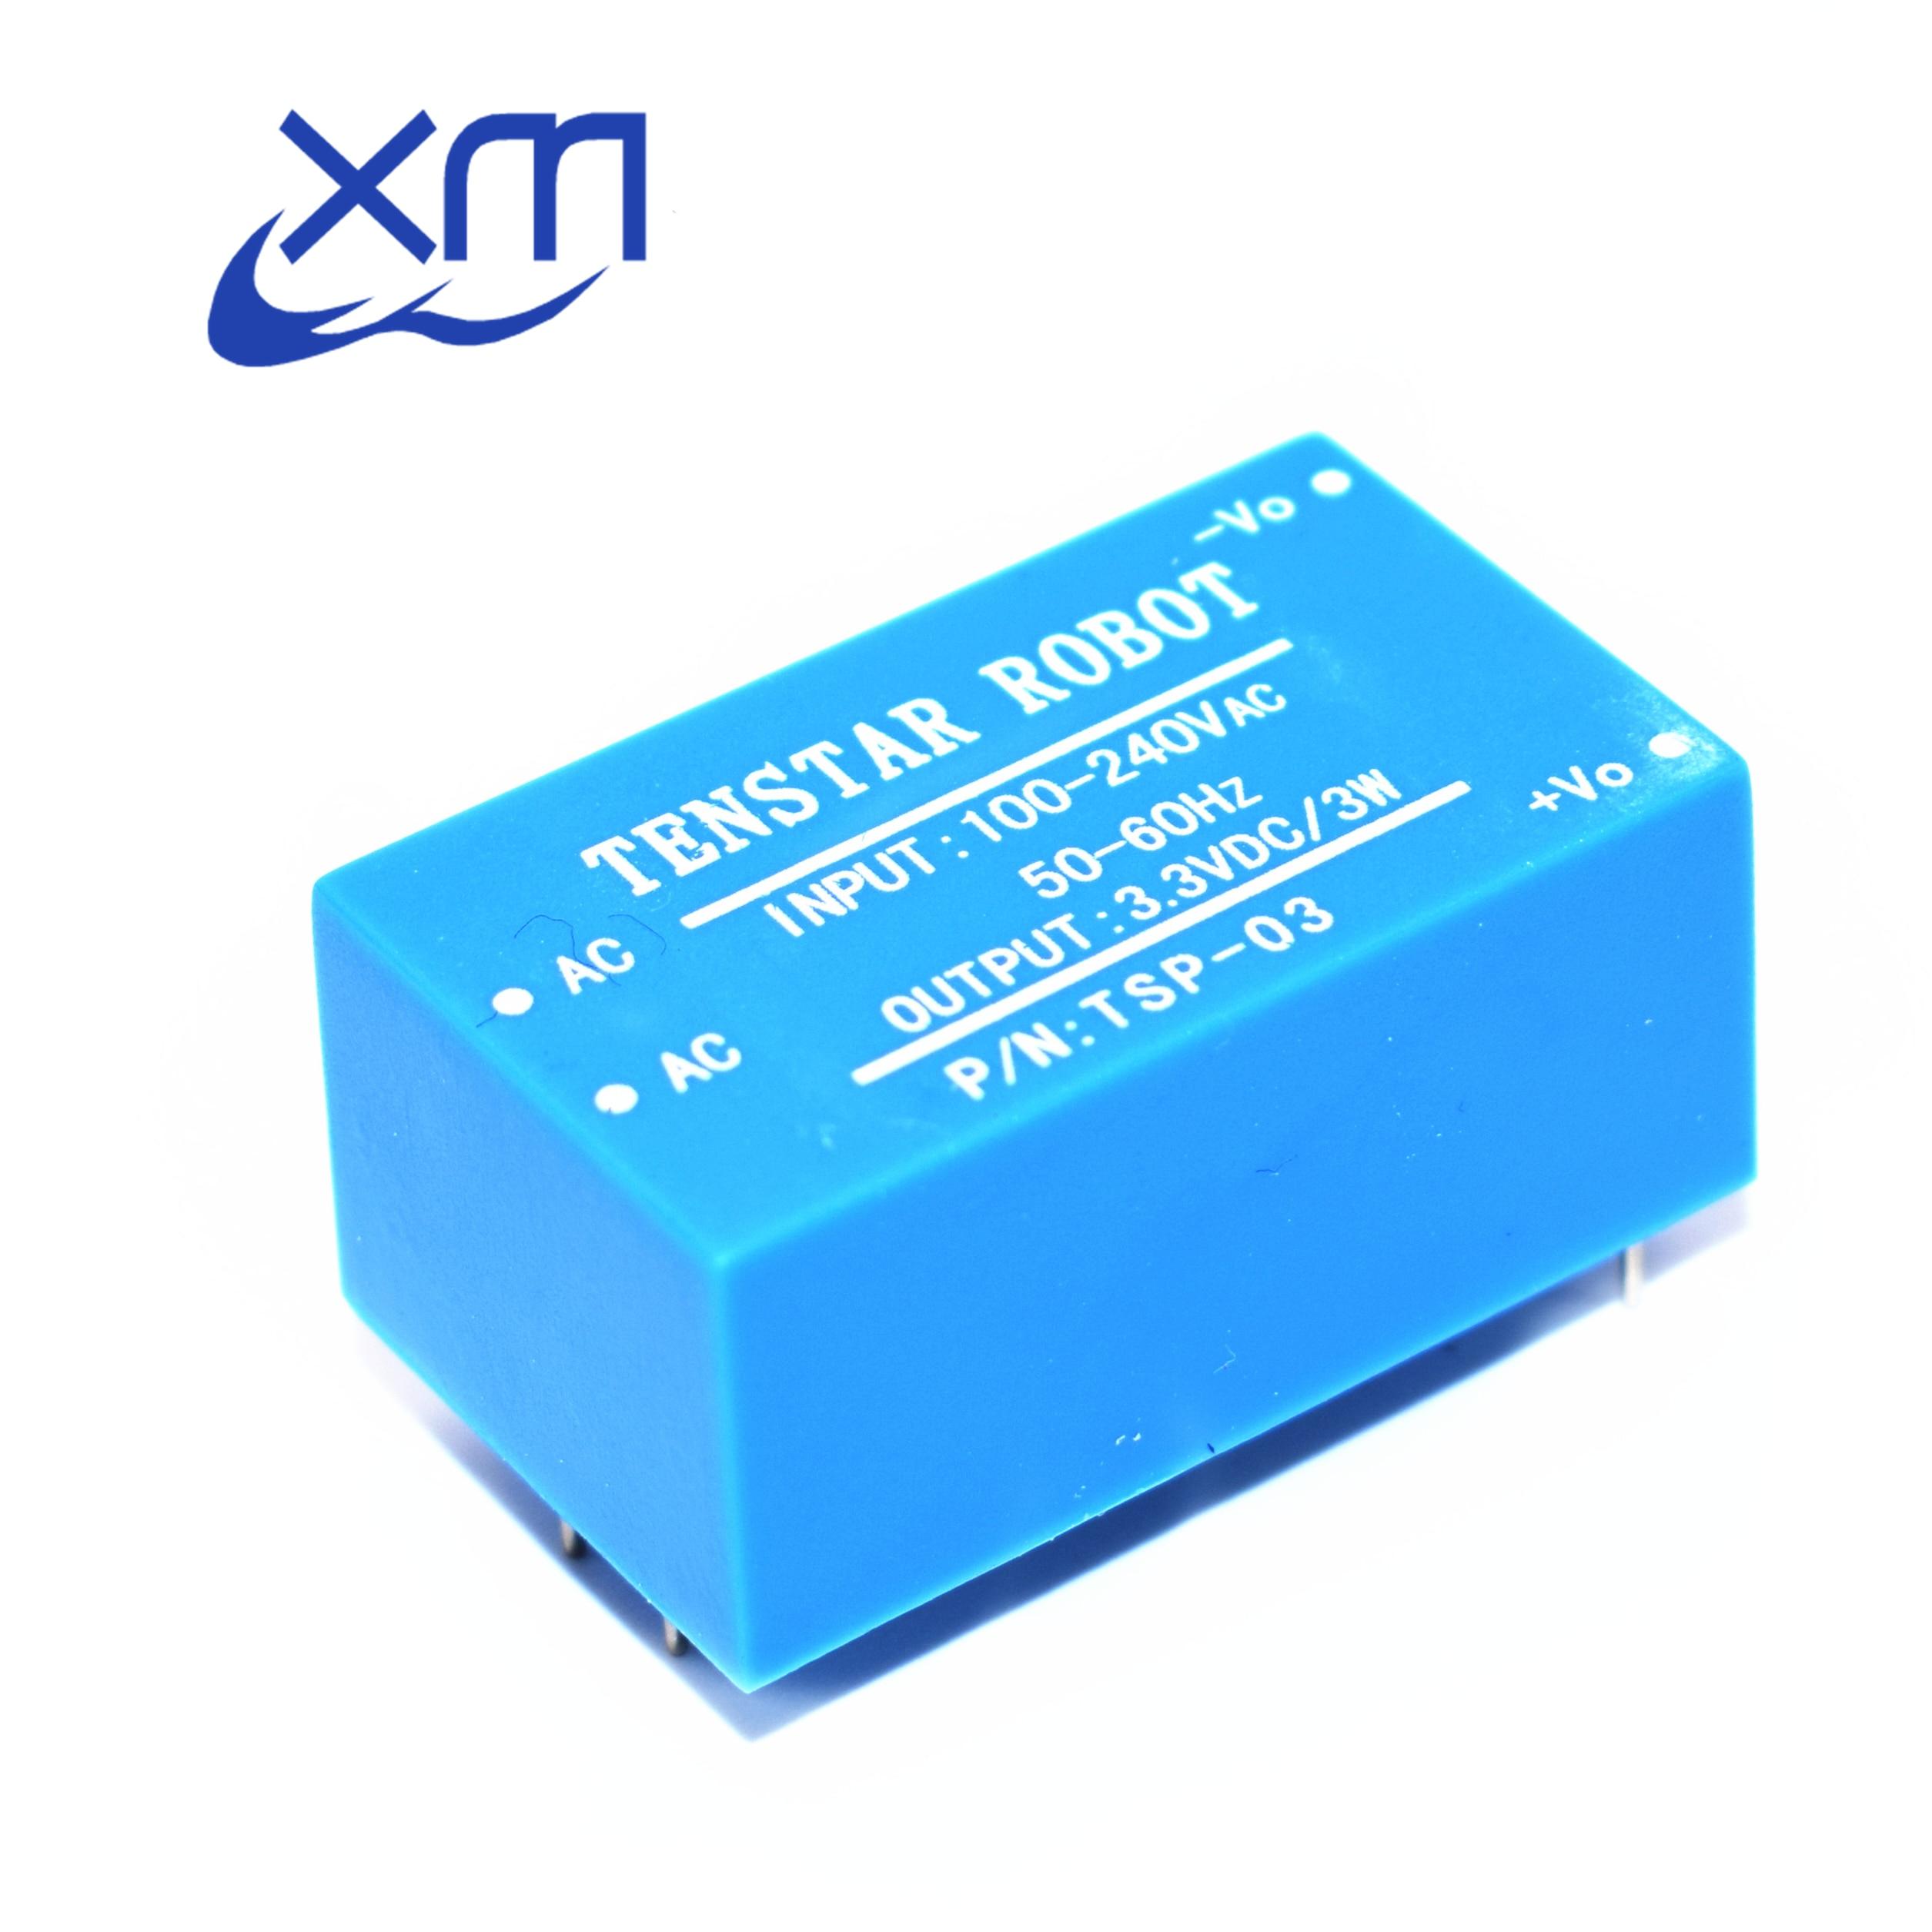 TSP-03 reemplazar HLK-PM03 AC-DC 220V a 3,3 V paso módulo de fuente de alimentación Buck inteligente interruptor para el hogar convertidor